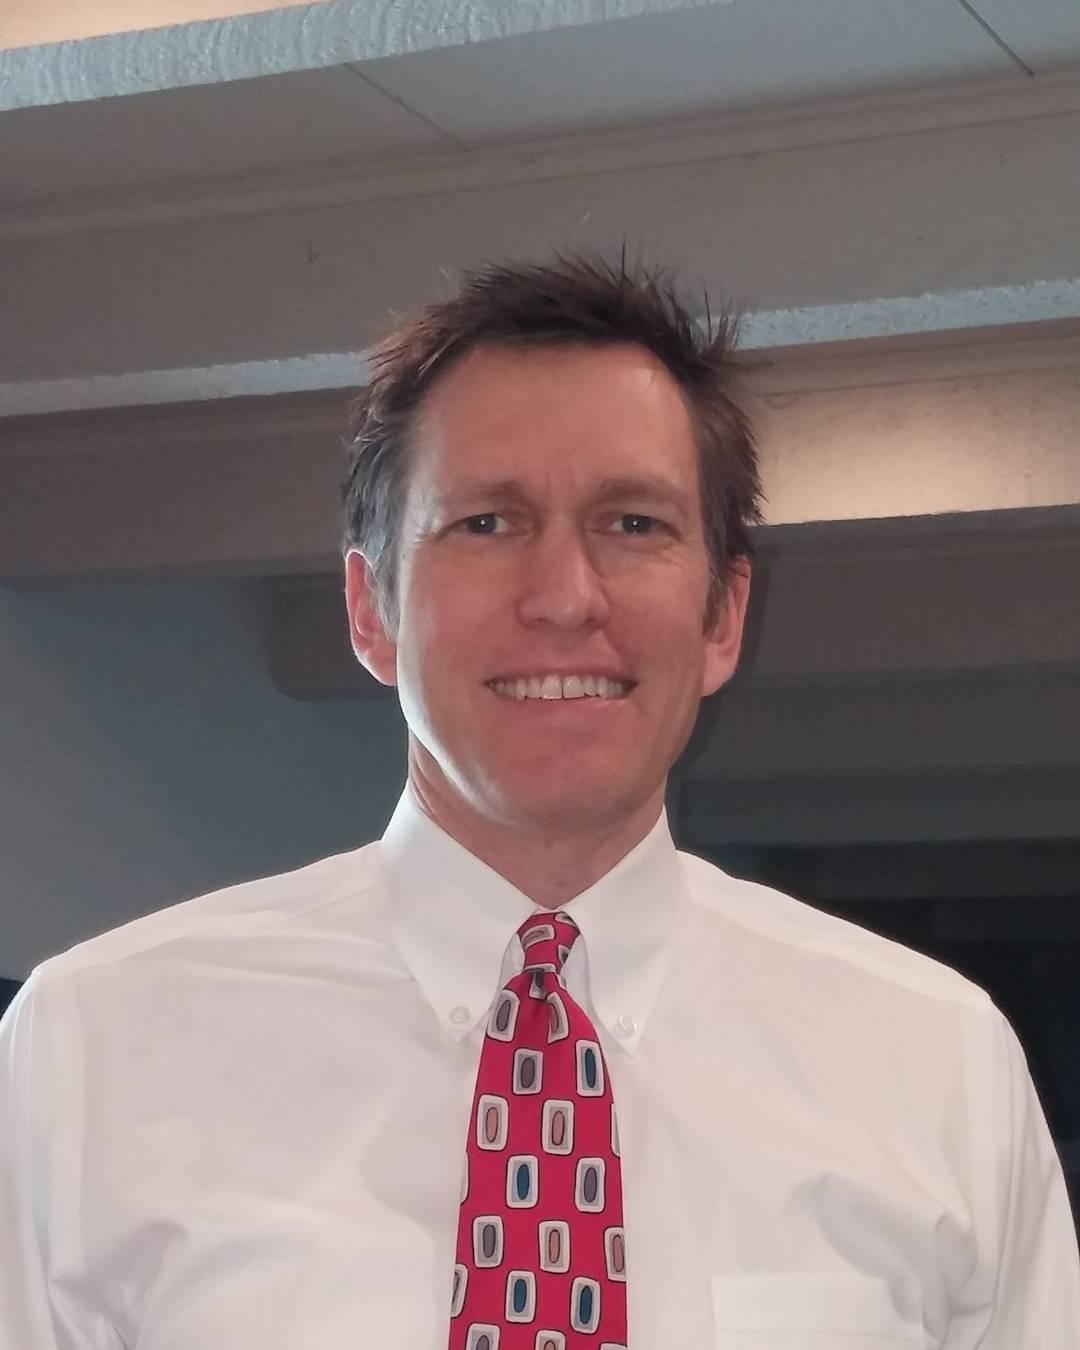 Trent Norman Larson